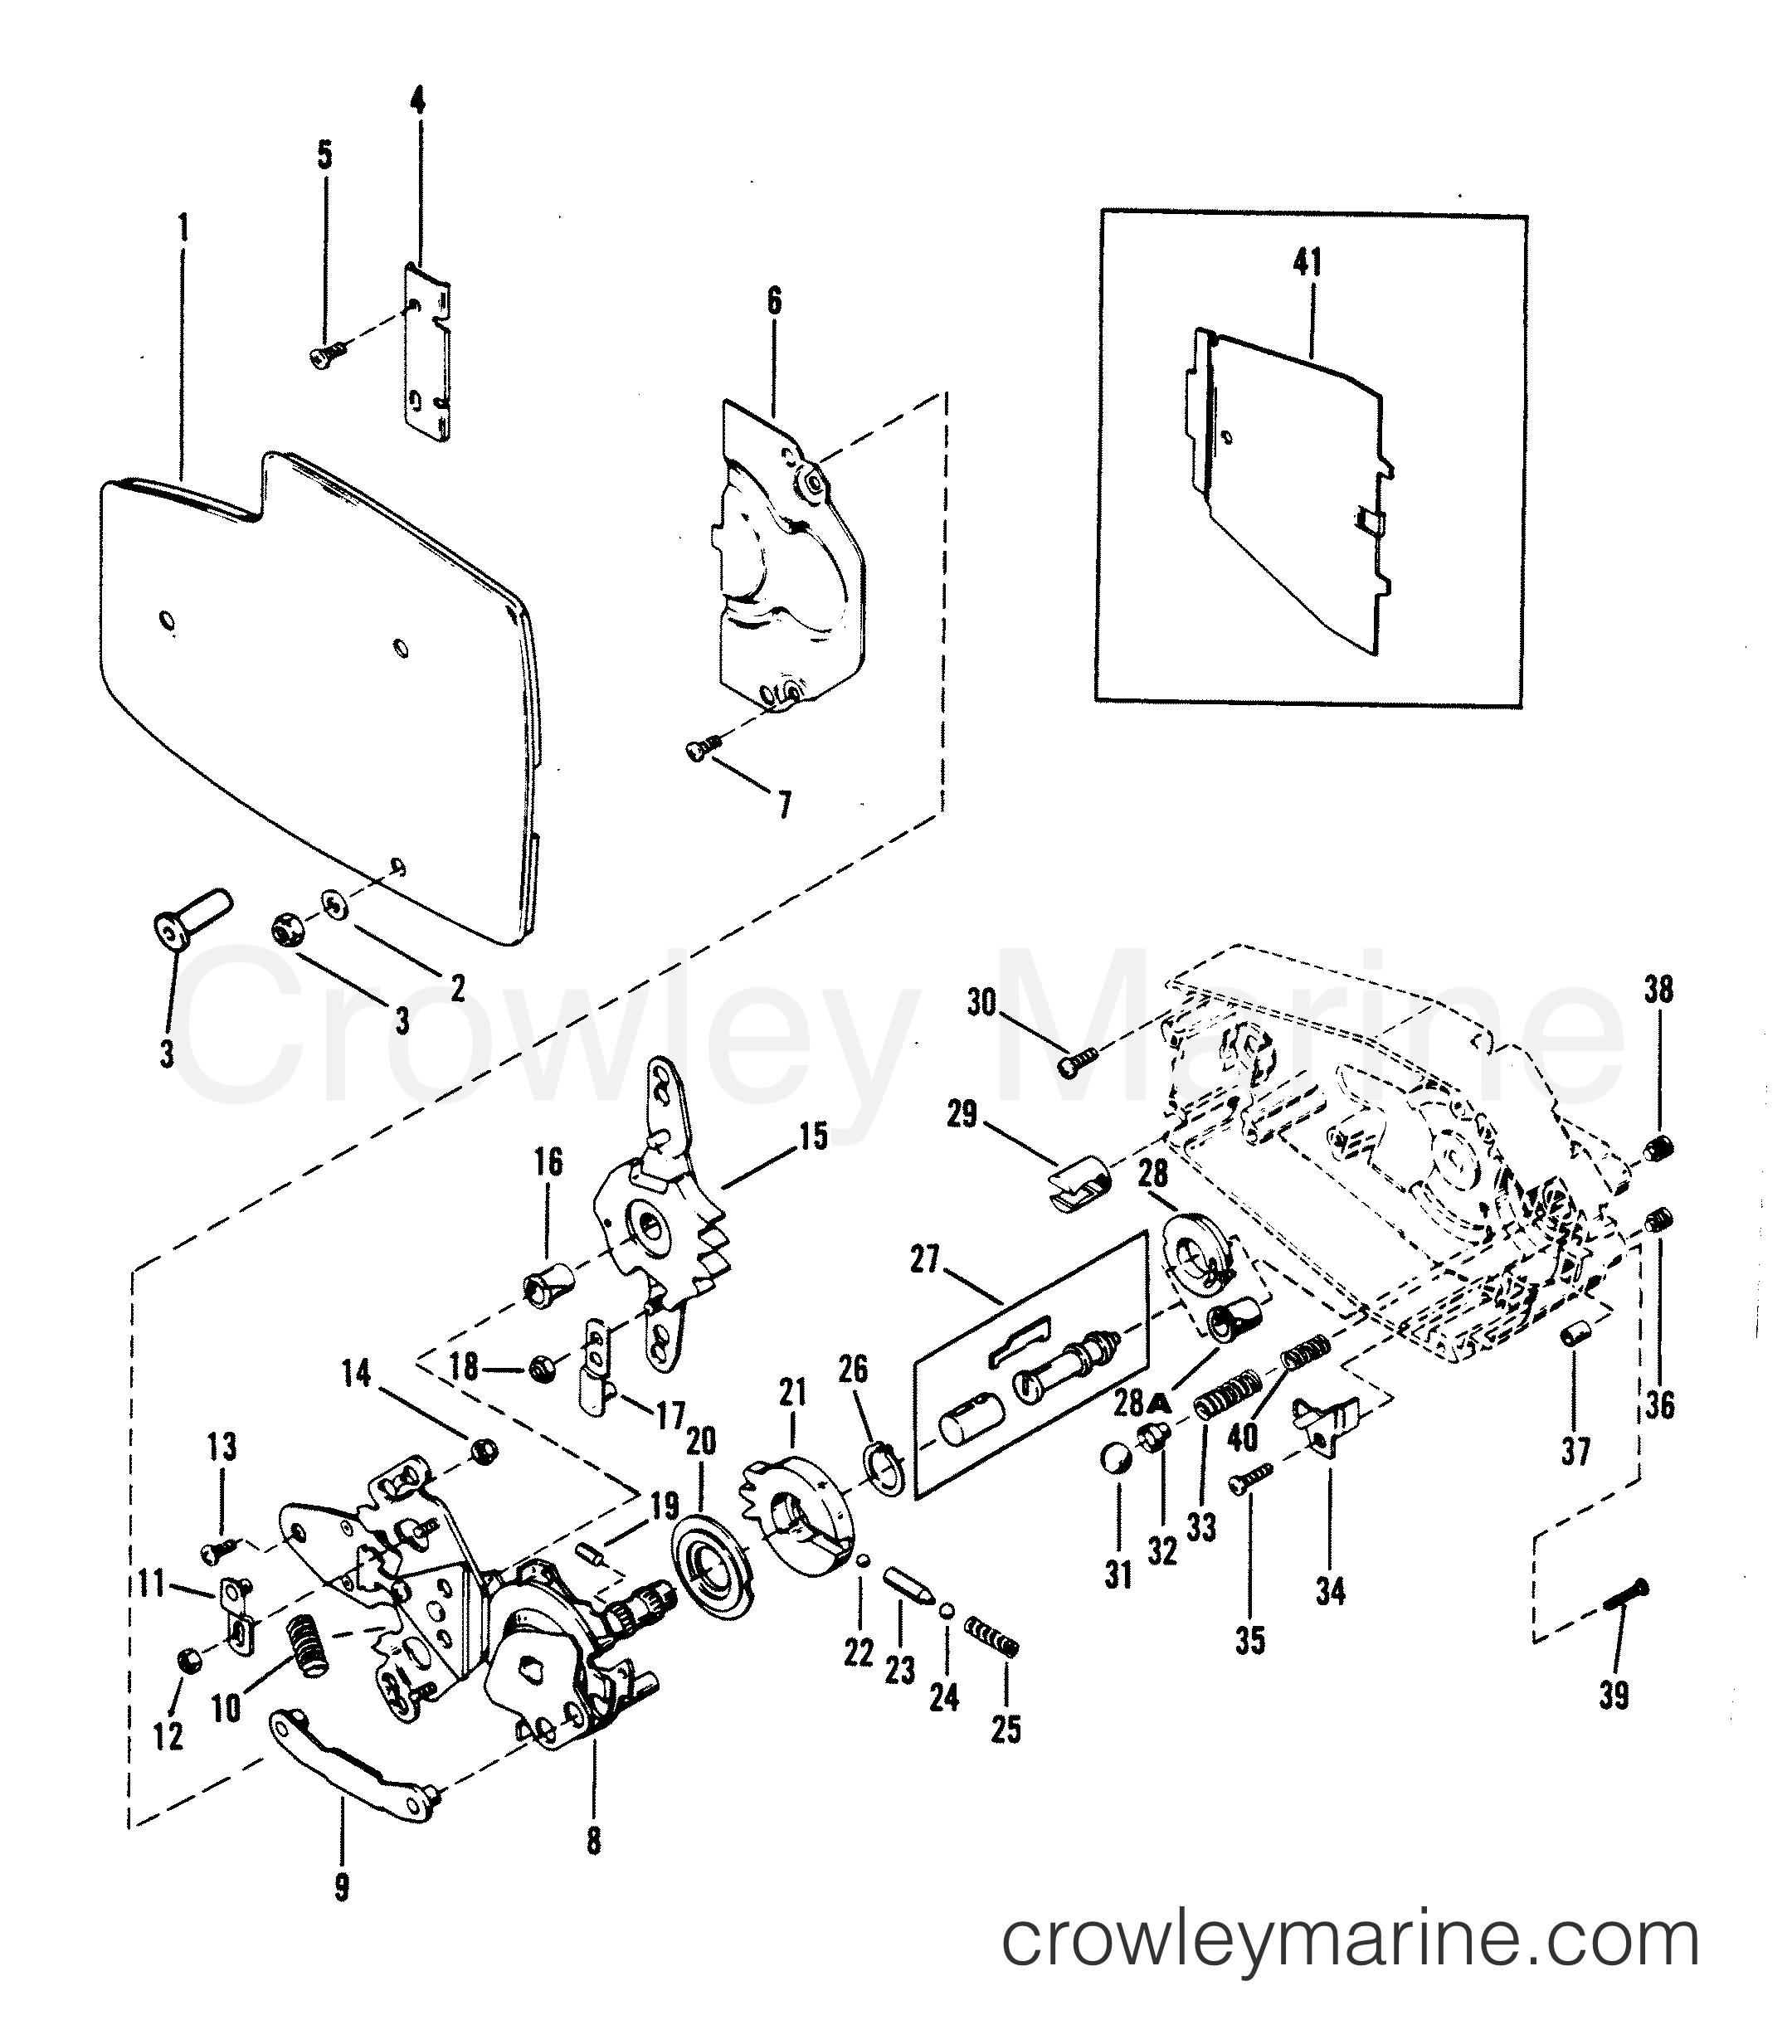 modular components